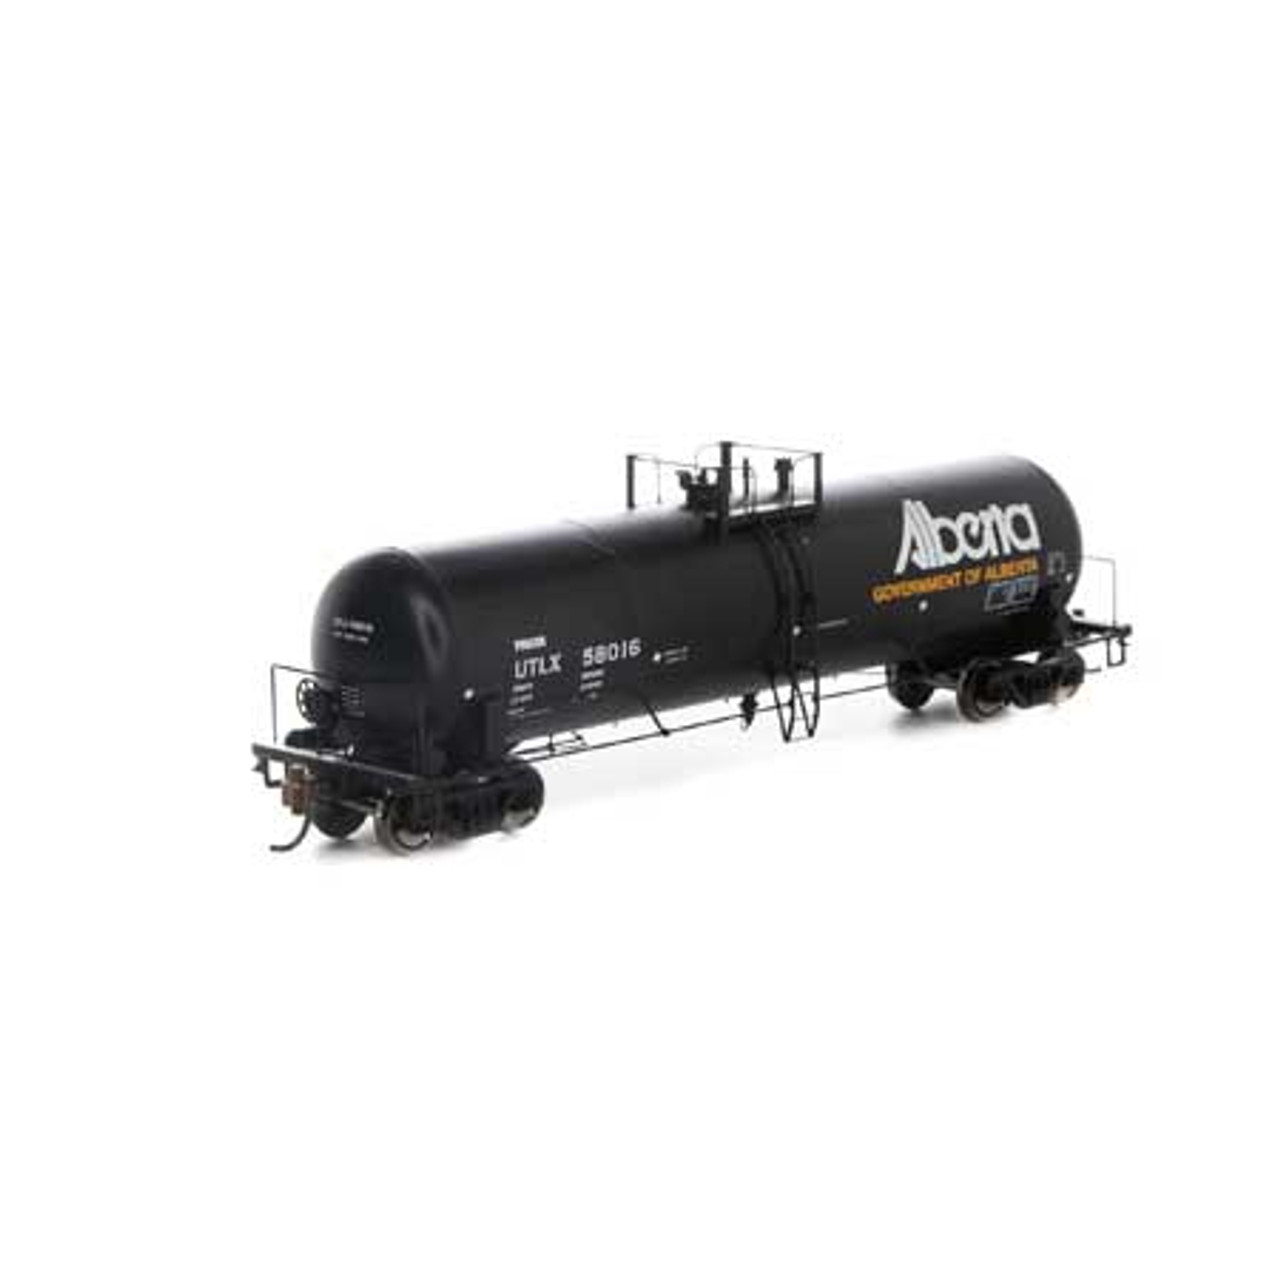 Athearn ATH15774 RTC 20K Tank Car ULTX - Alberta #58016  (Scale =HO) Part #ATH15774